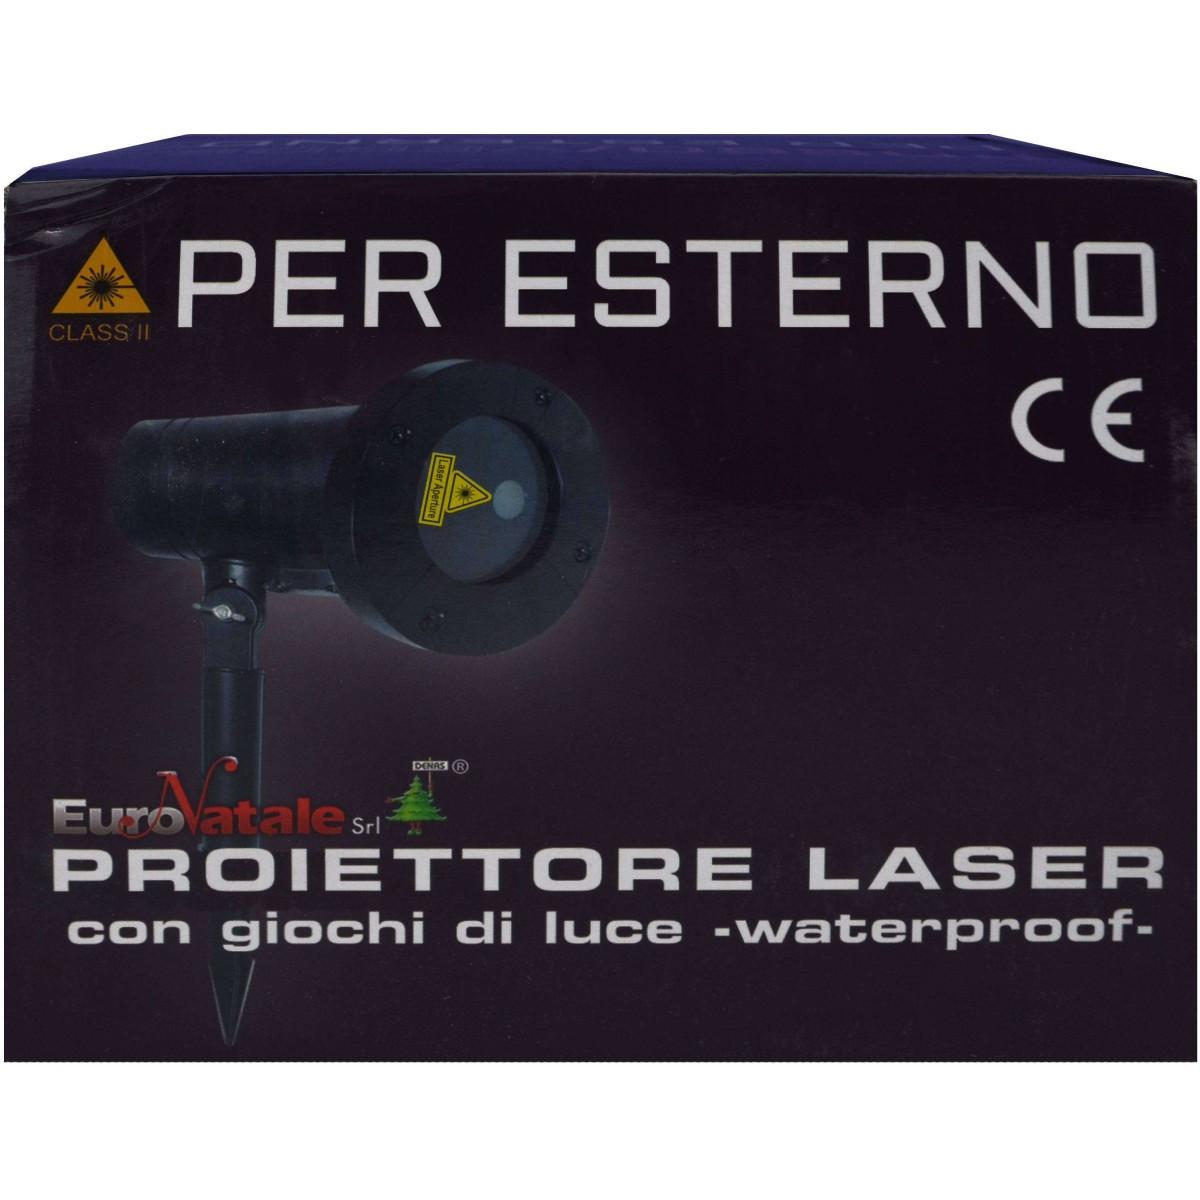 Proiettore Luci Laser Natalizie.Buy Proiettore Laser Natale Esterno